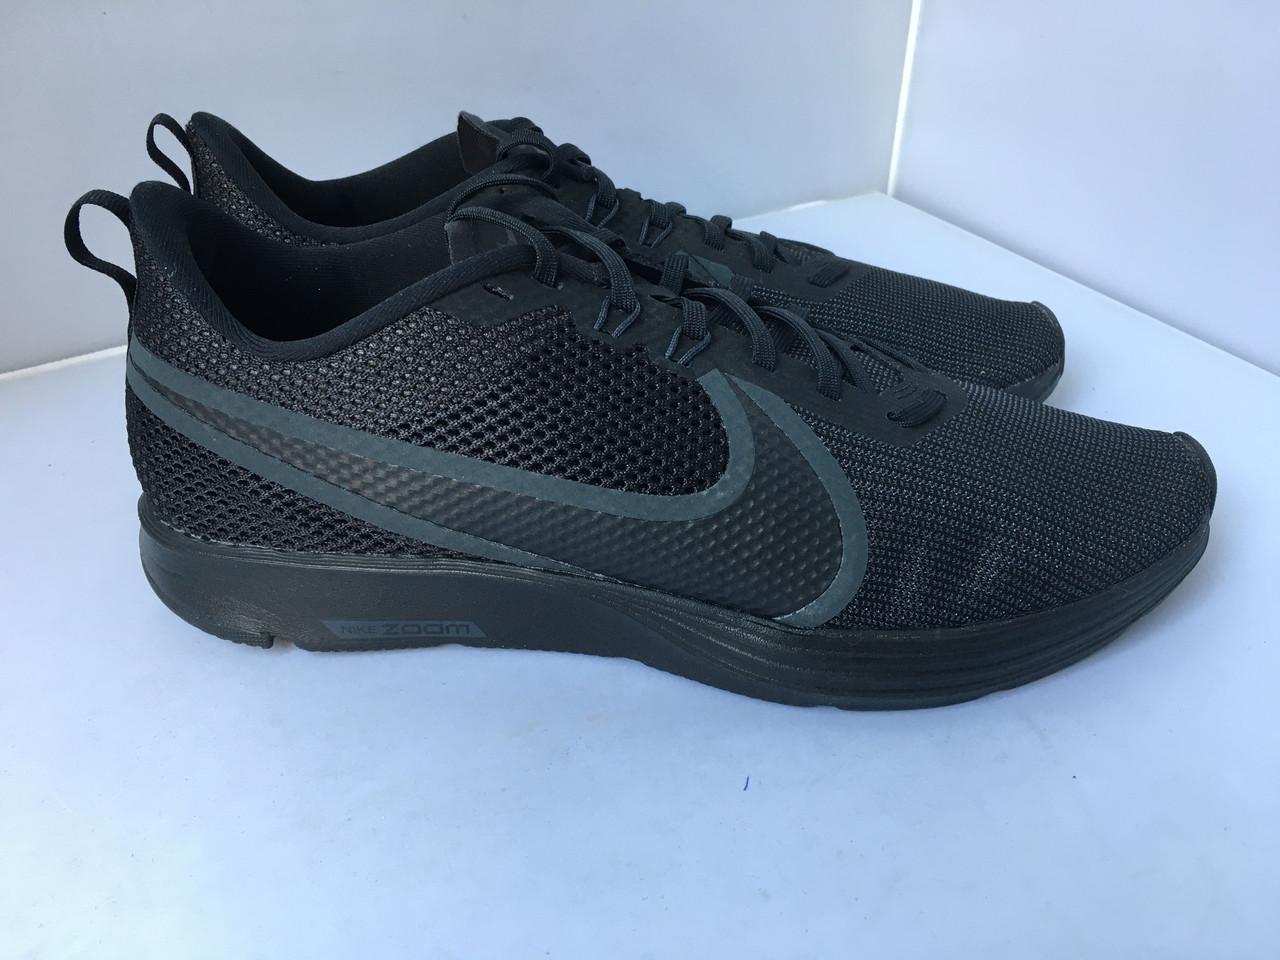 Беговые кроссовки Nike Zoom Streak 2, 45 размер